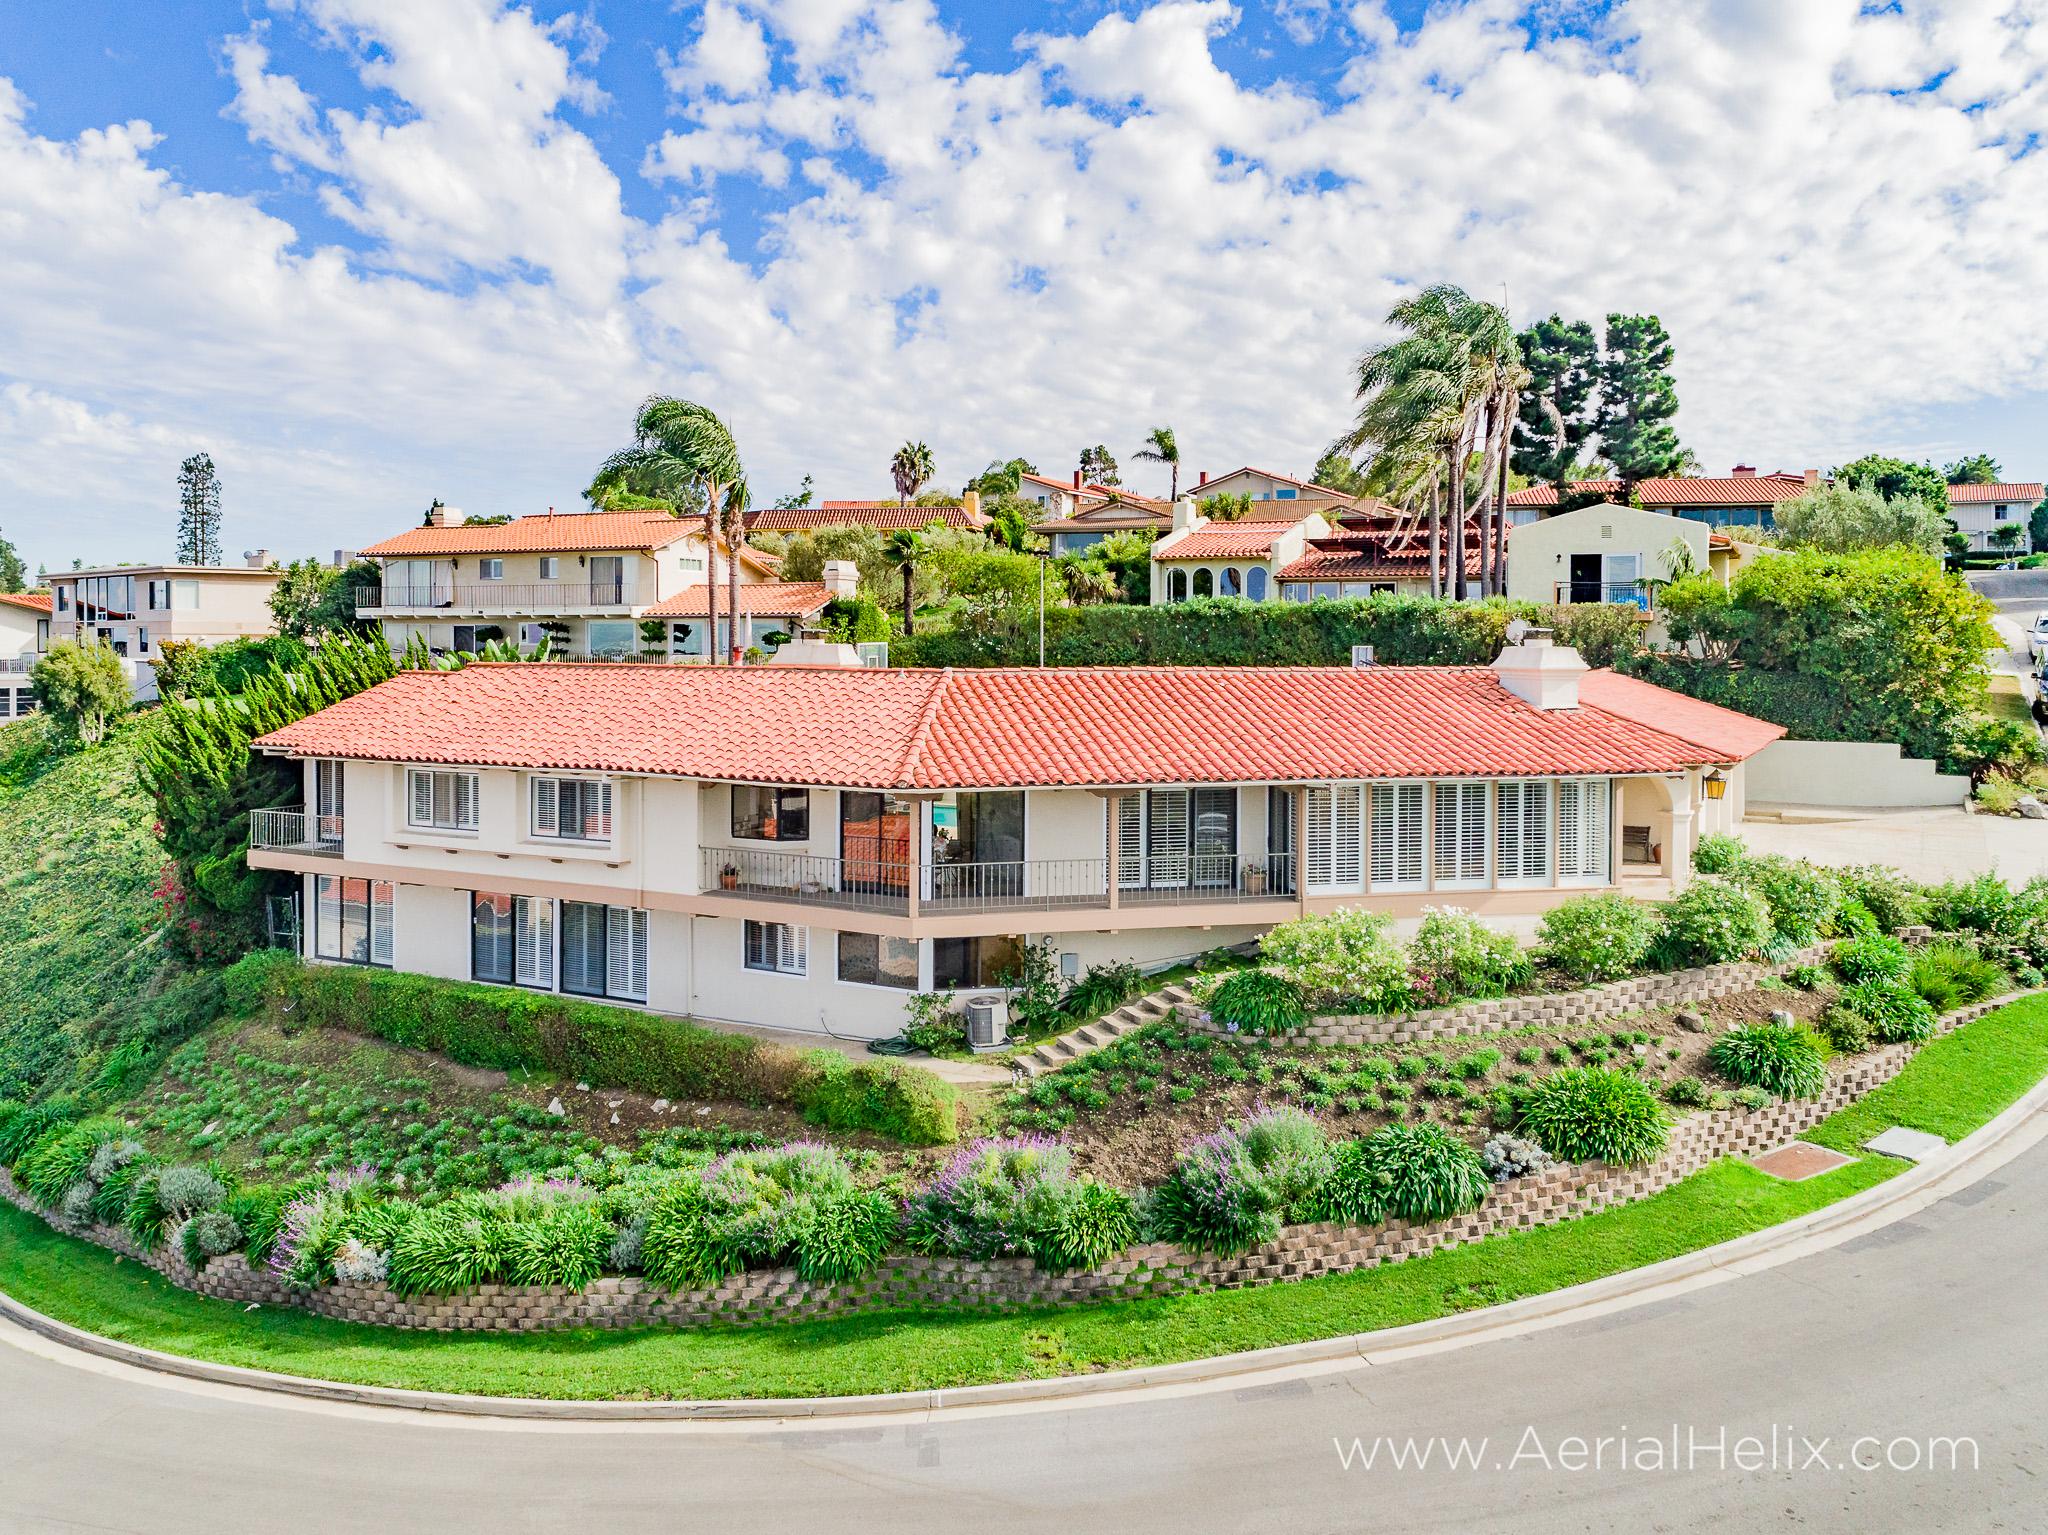 Woodfern Drive - HELIX Real Estate Aerial Photographer-12.jpg